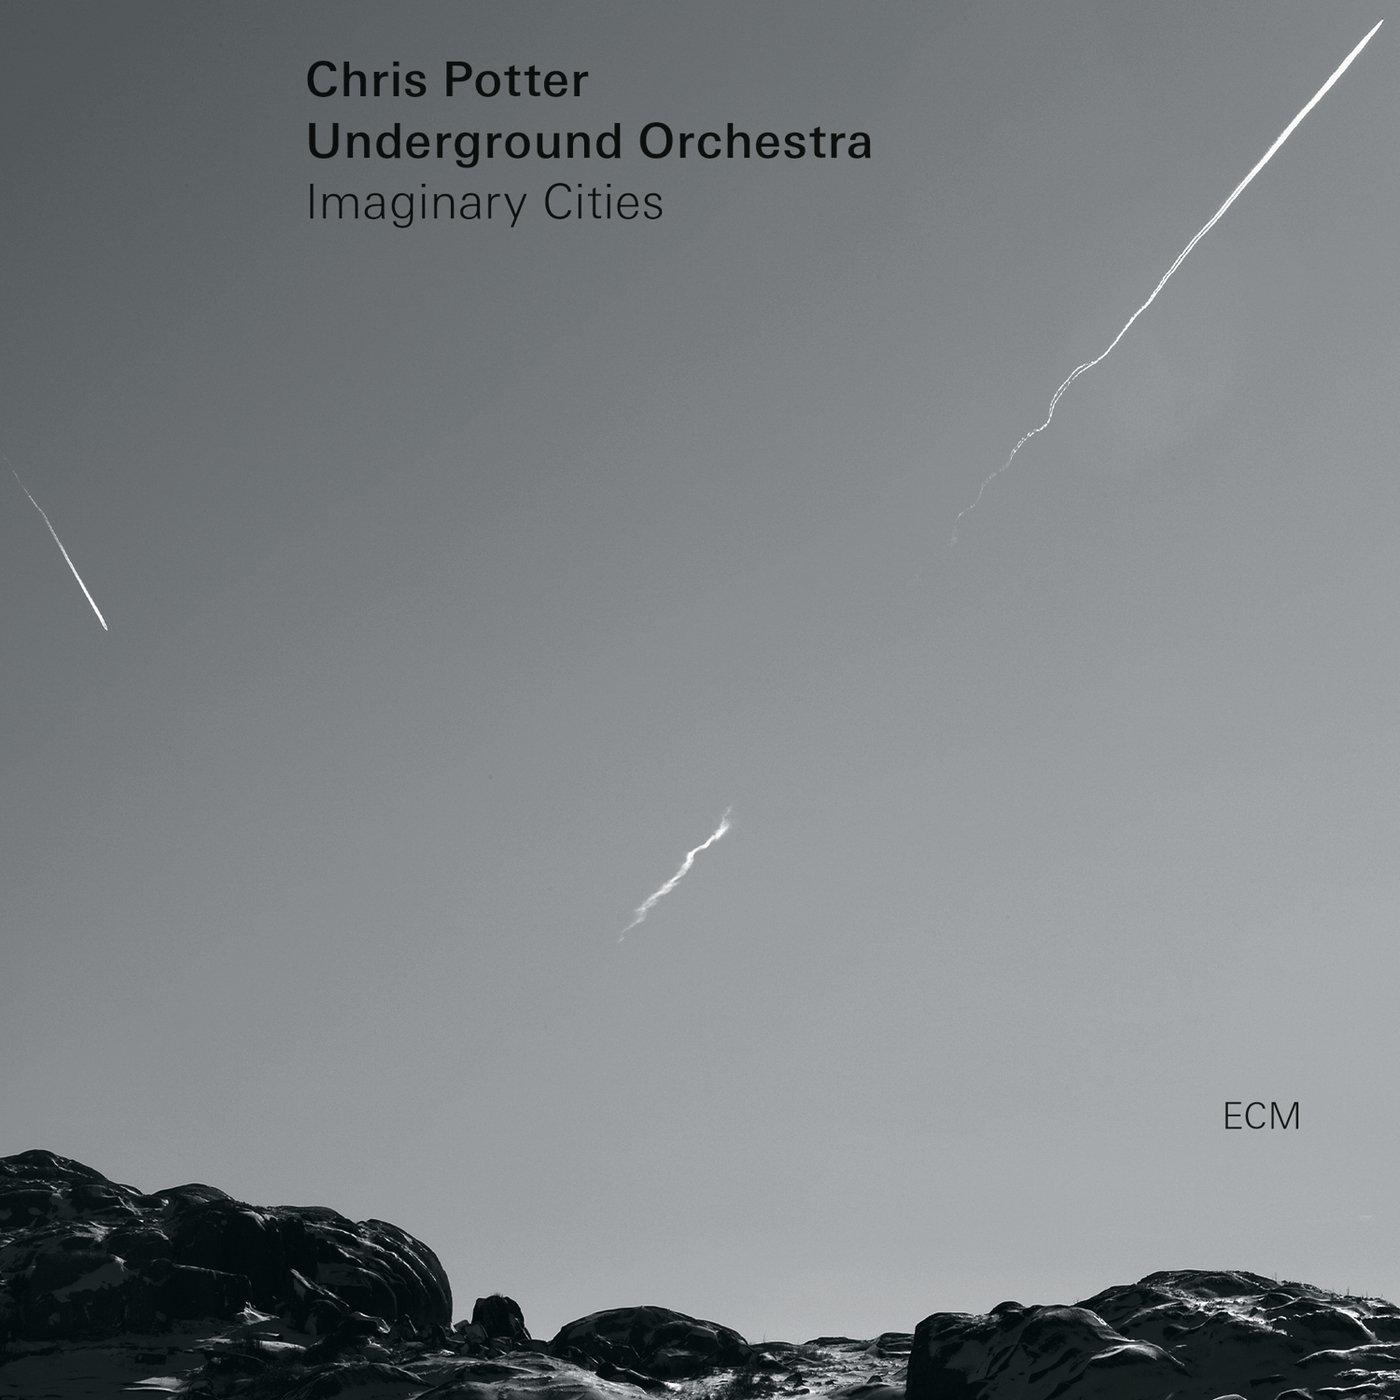 Vinilo : Imaginary Cities - Chris Potter Orchestra (2PC)